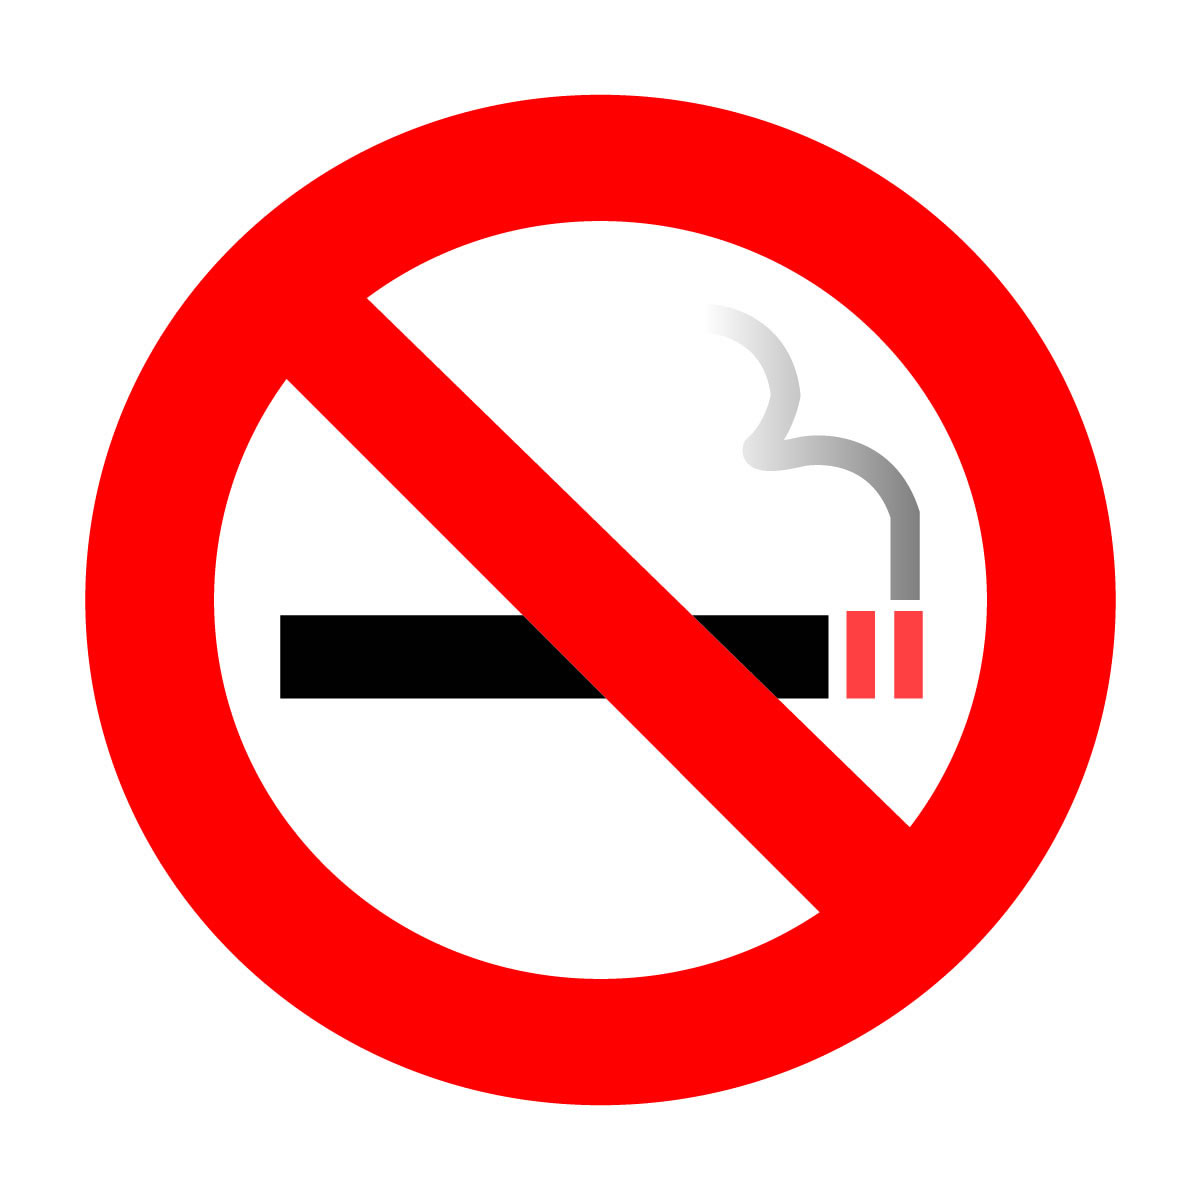 Free No Smoking Sign, Download Free Clip Art, Free Clip Art.